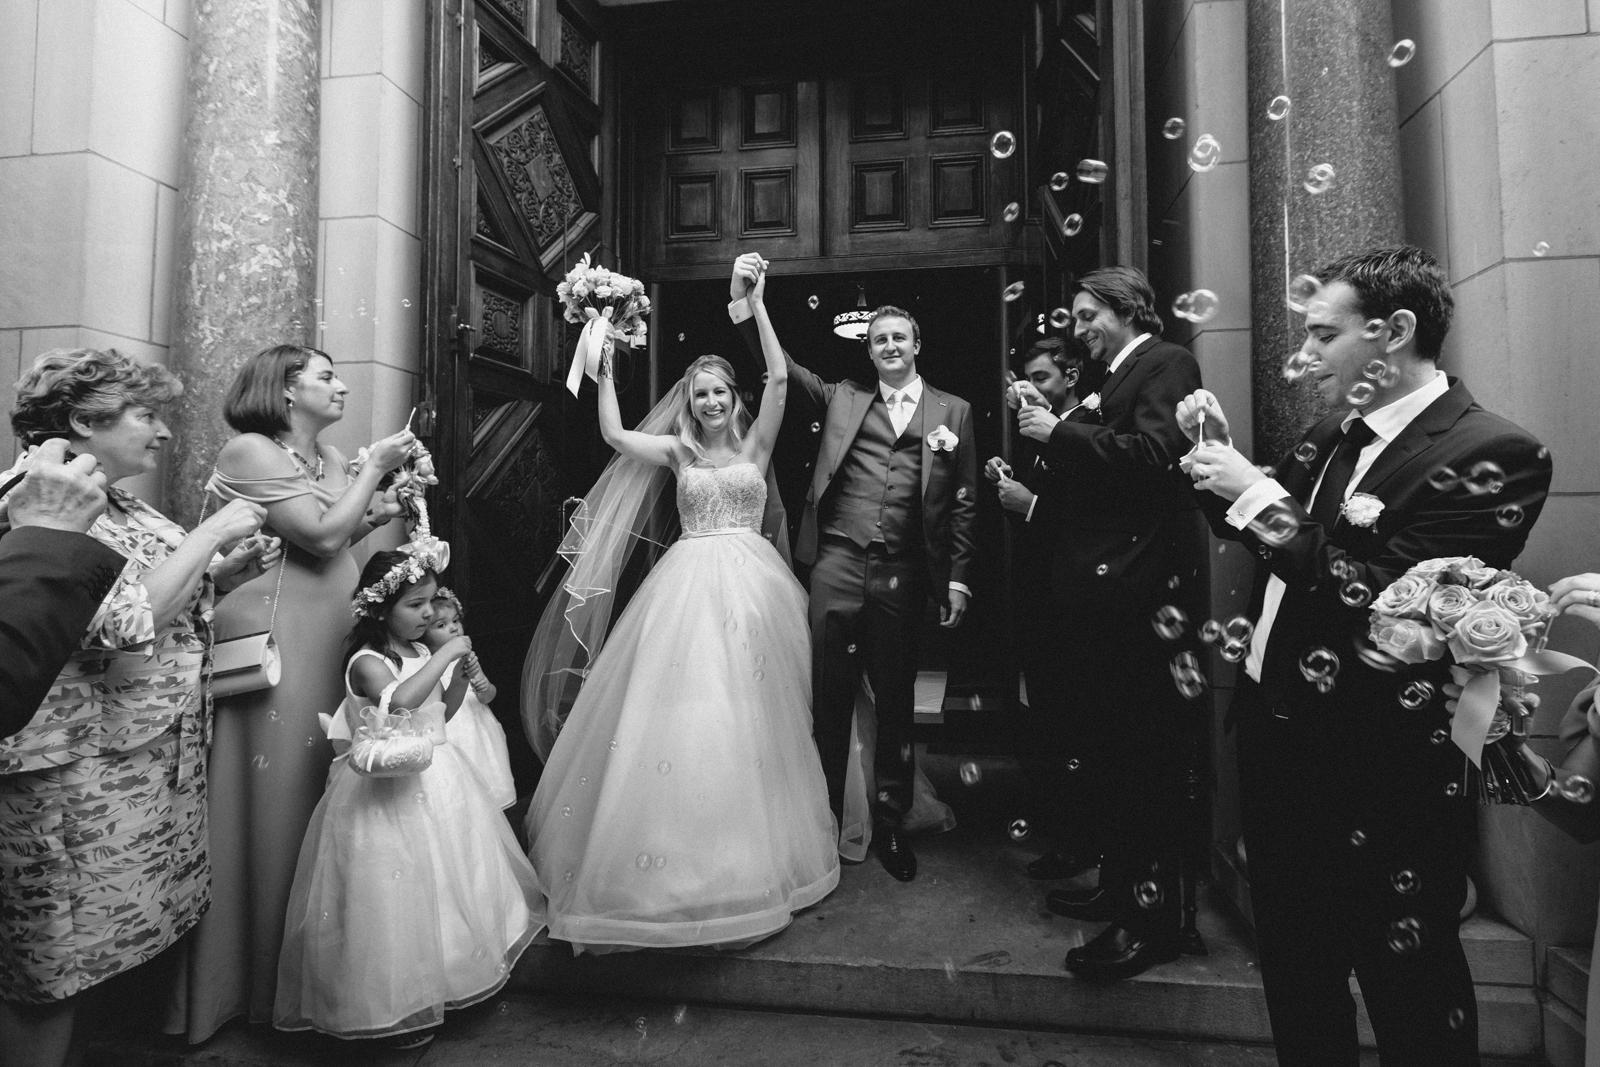 NYC Wedding Photography Sofitel Central Park Brooklyn Photographer Boris Zaretsky _B2C2430.jpg